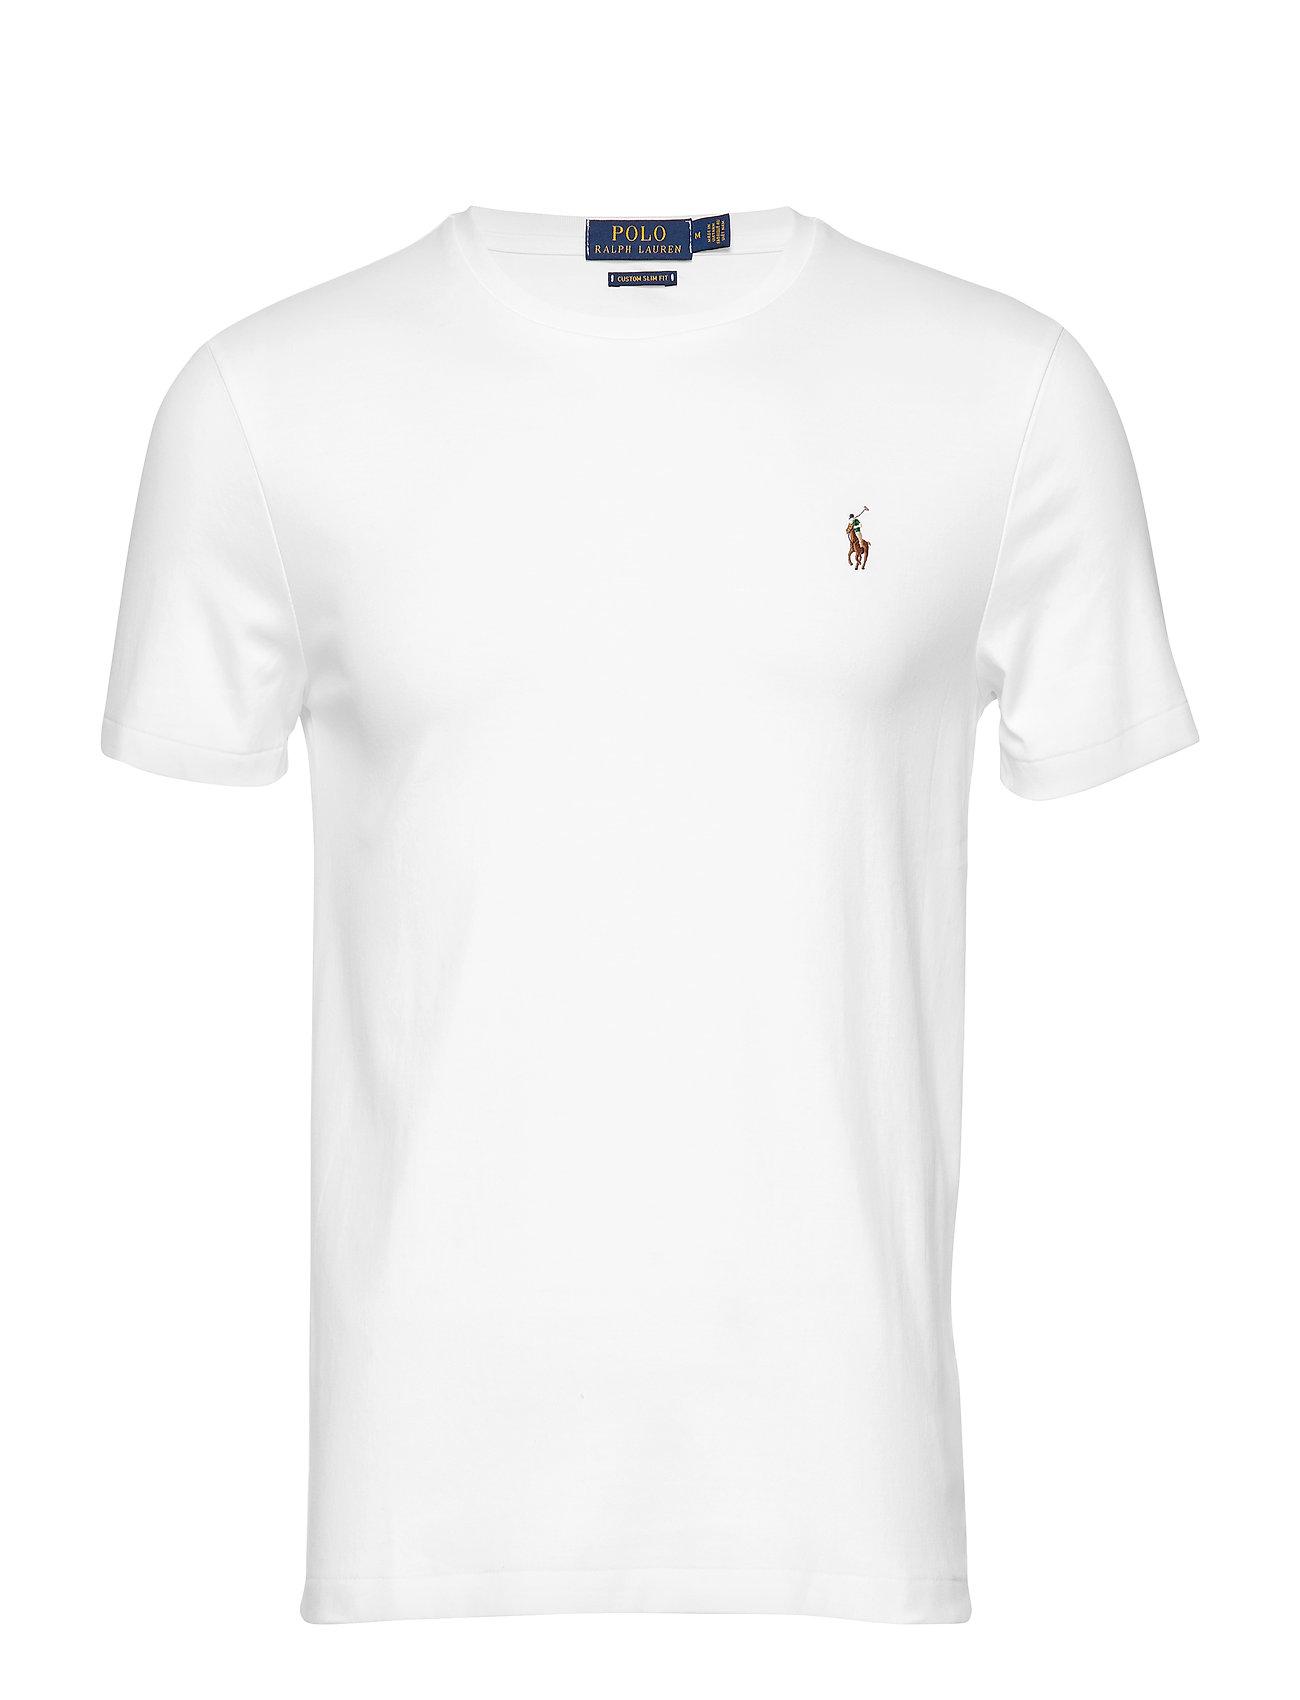 Polo Ralph Lauren Custom Slim Fit Interlock Tee - WHITE